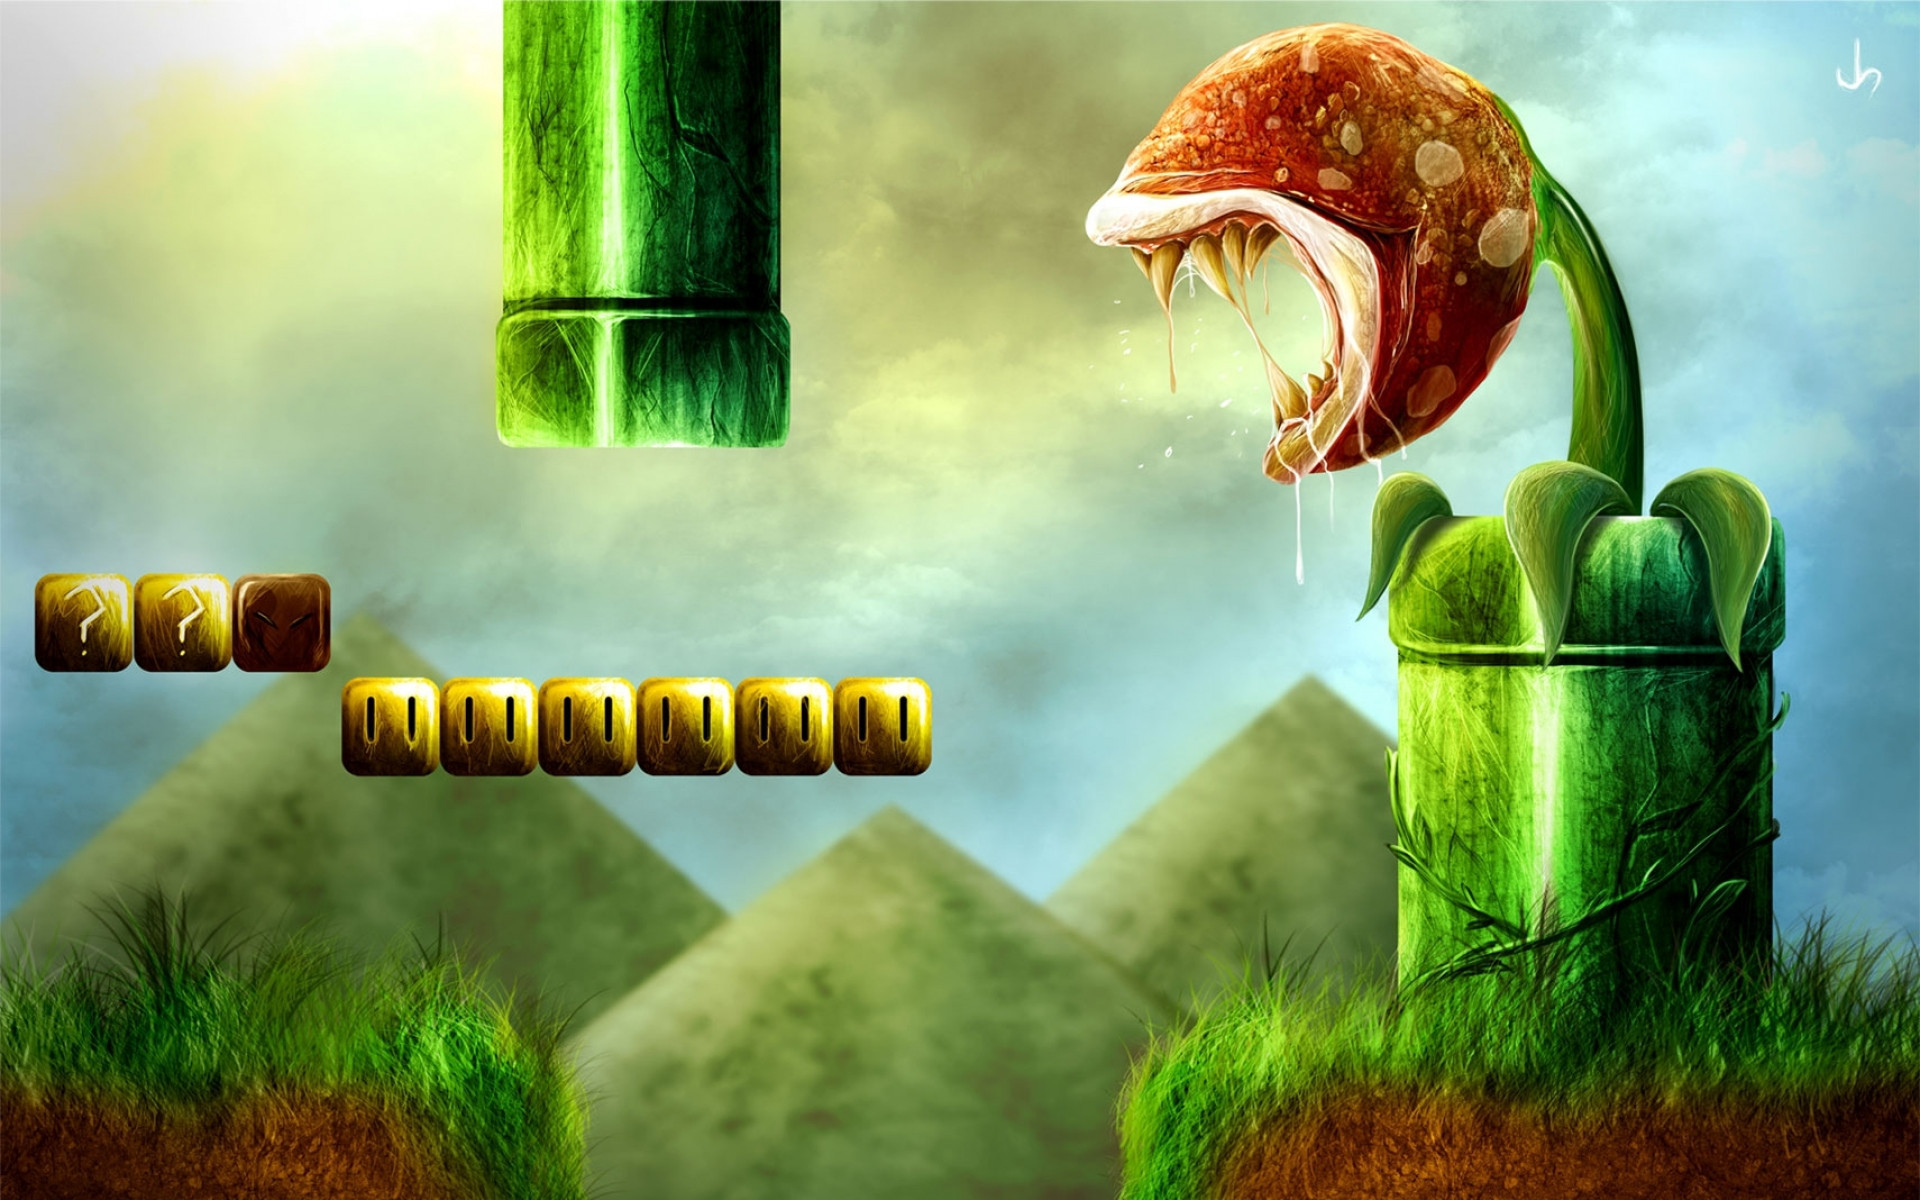 Video game wallpaper dump  Enjoy  - Album on Imgur